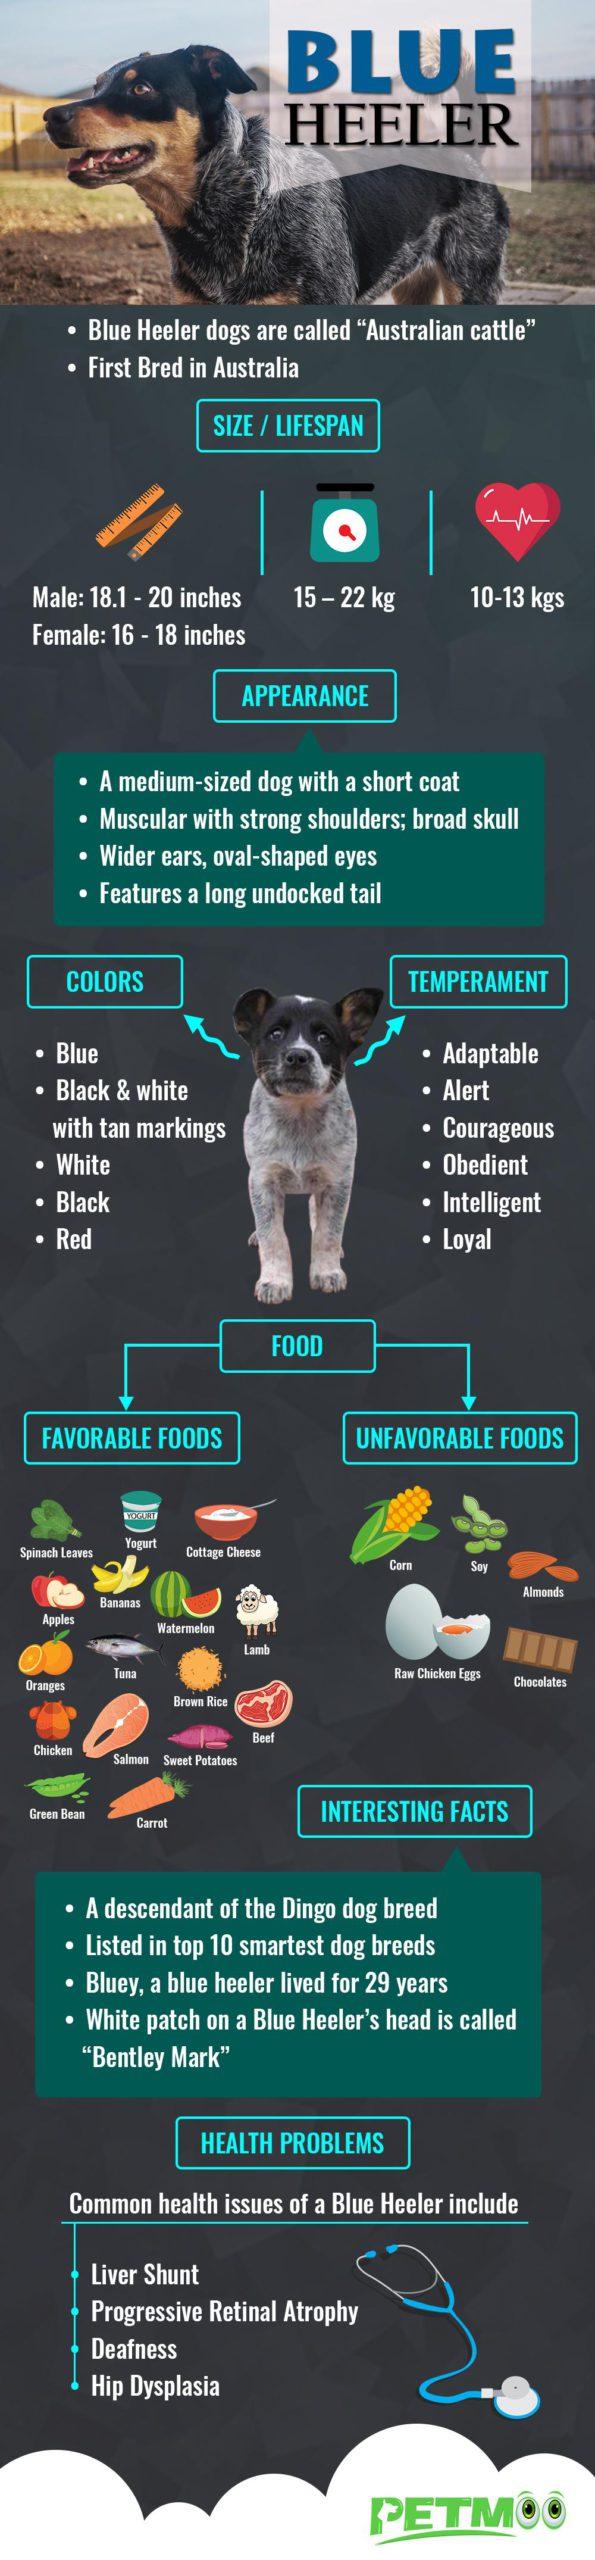 Blue Heeler Infographic